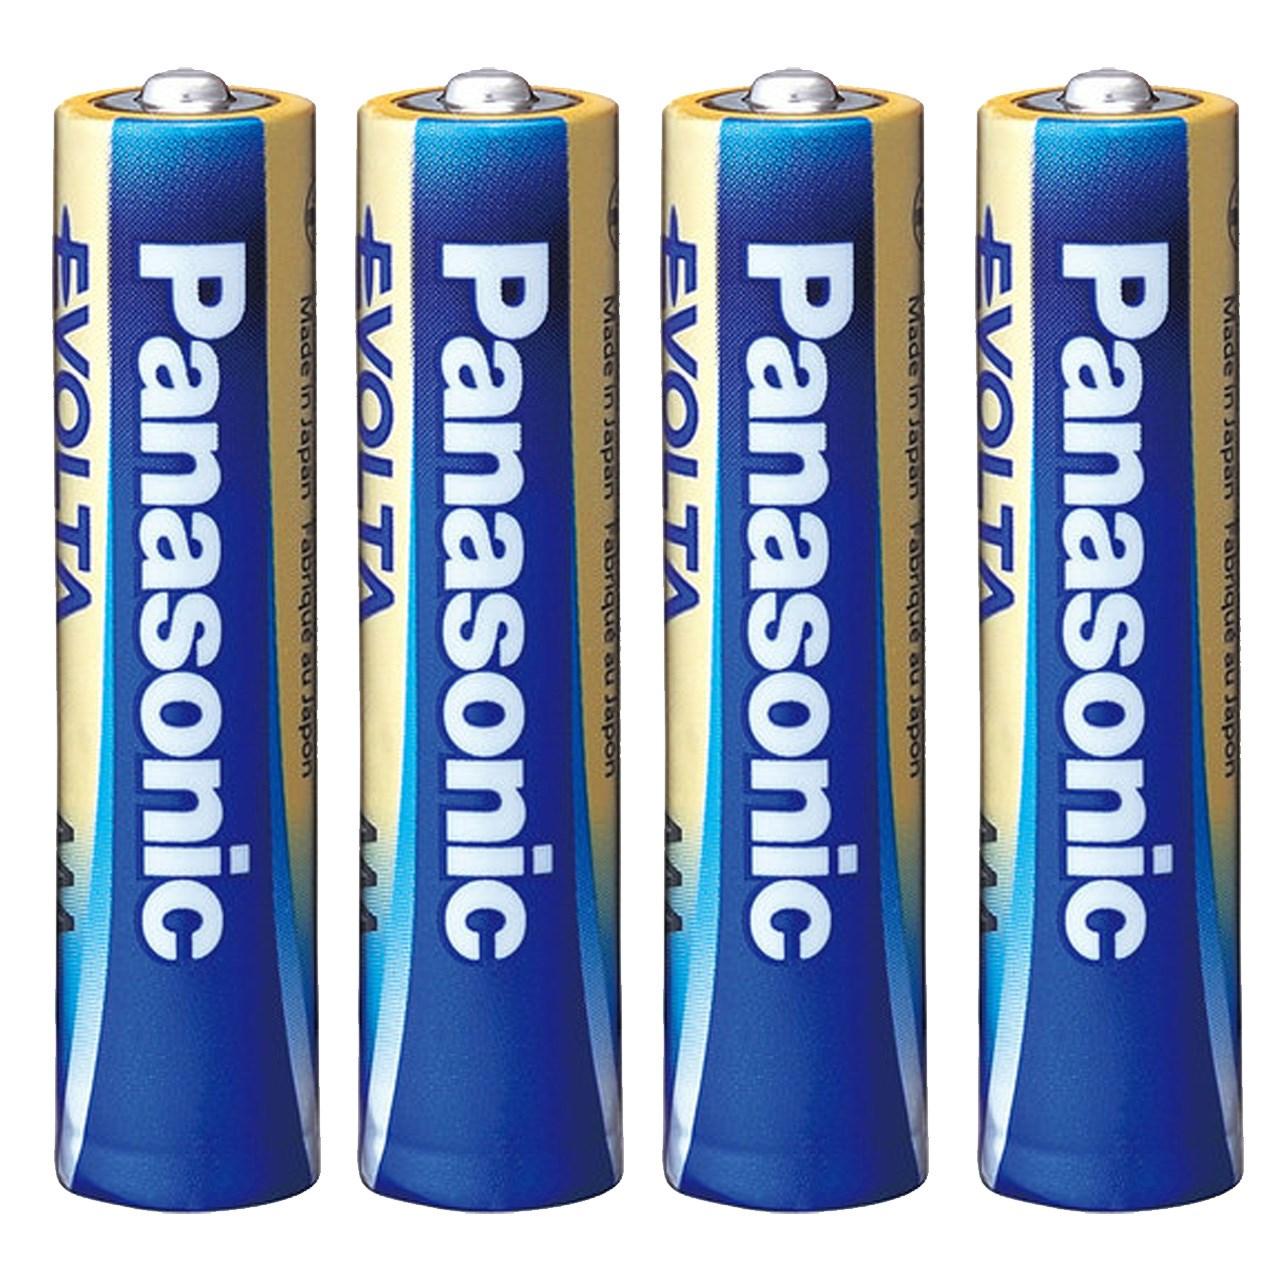 باتری نیم قلمی پاناسونیک مدل High-Tech Evolta Alkaline بسته 4 عددی